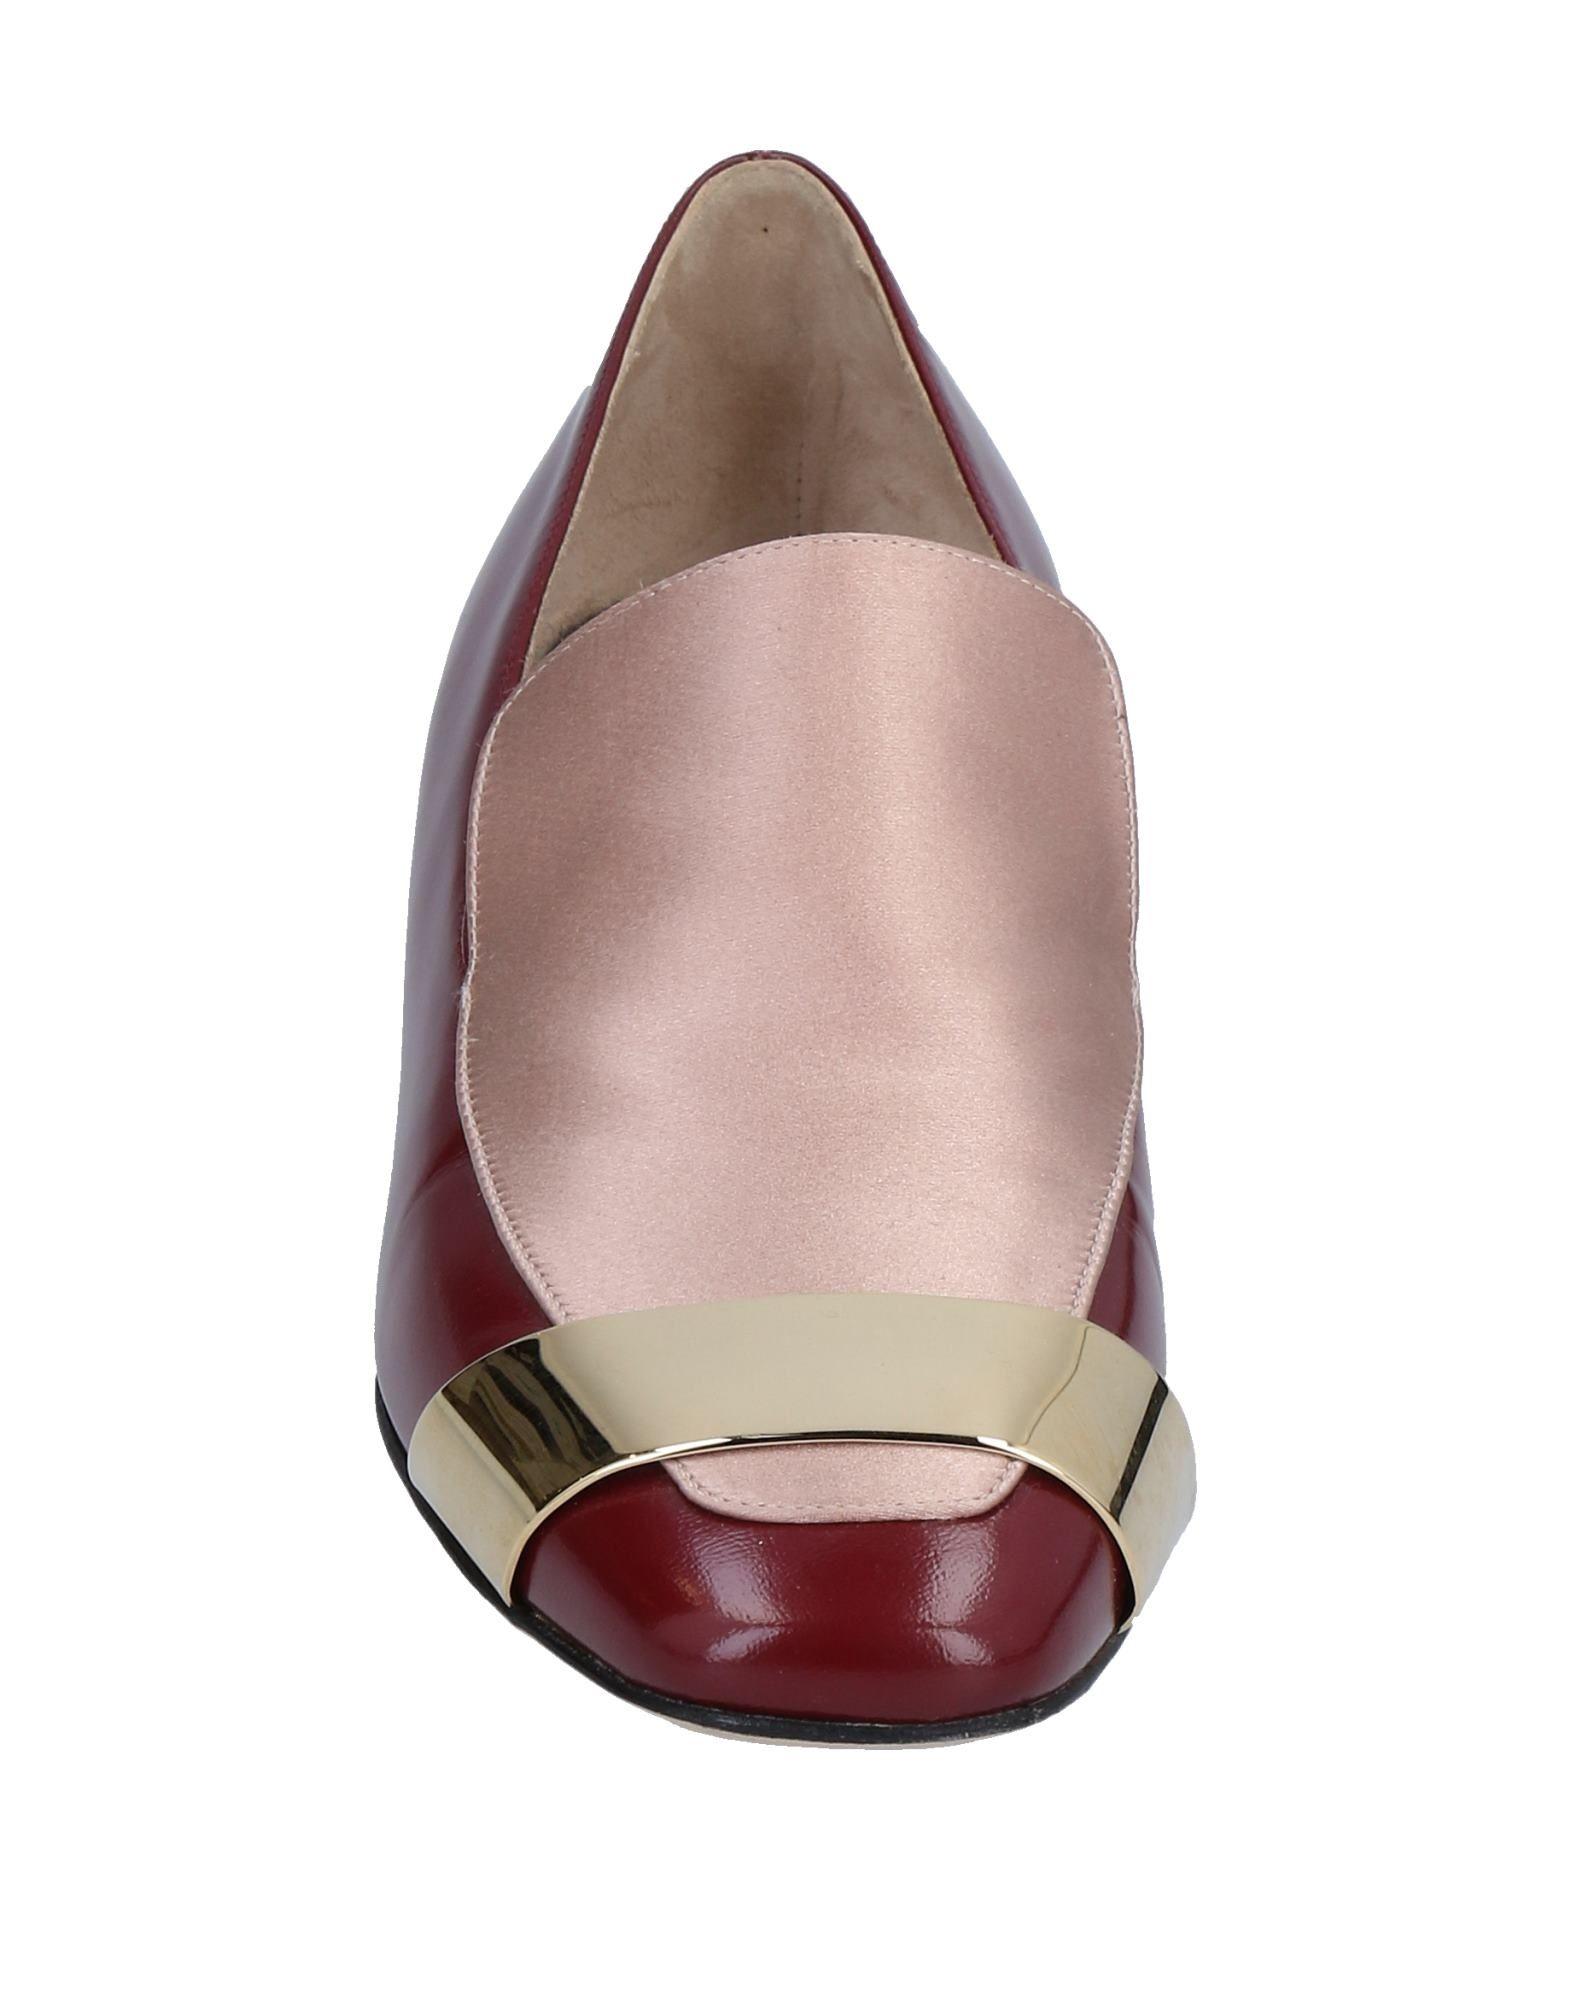 Paula Cademartori Mokassins 11535206RLGünstige Damen 11535206RLGünstige Mokassins gut aussehende Schuhe 7b86a6